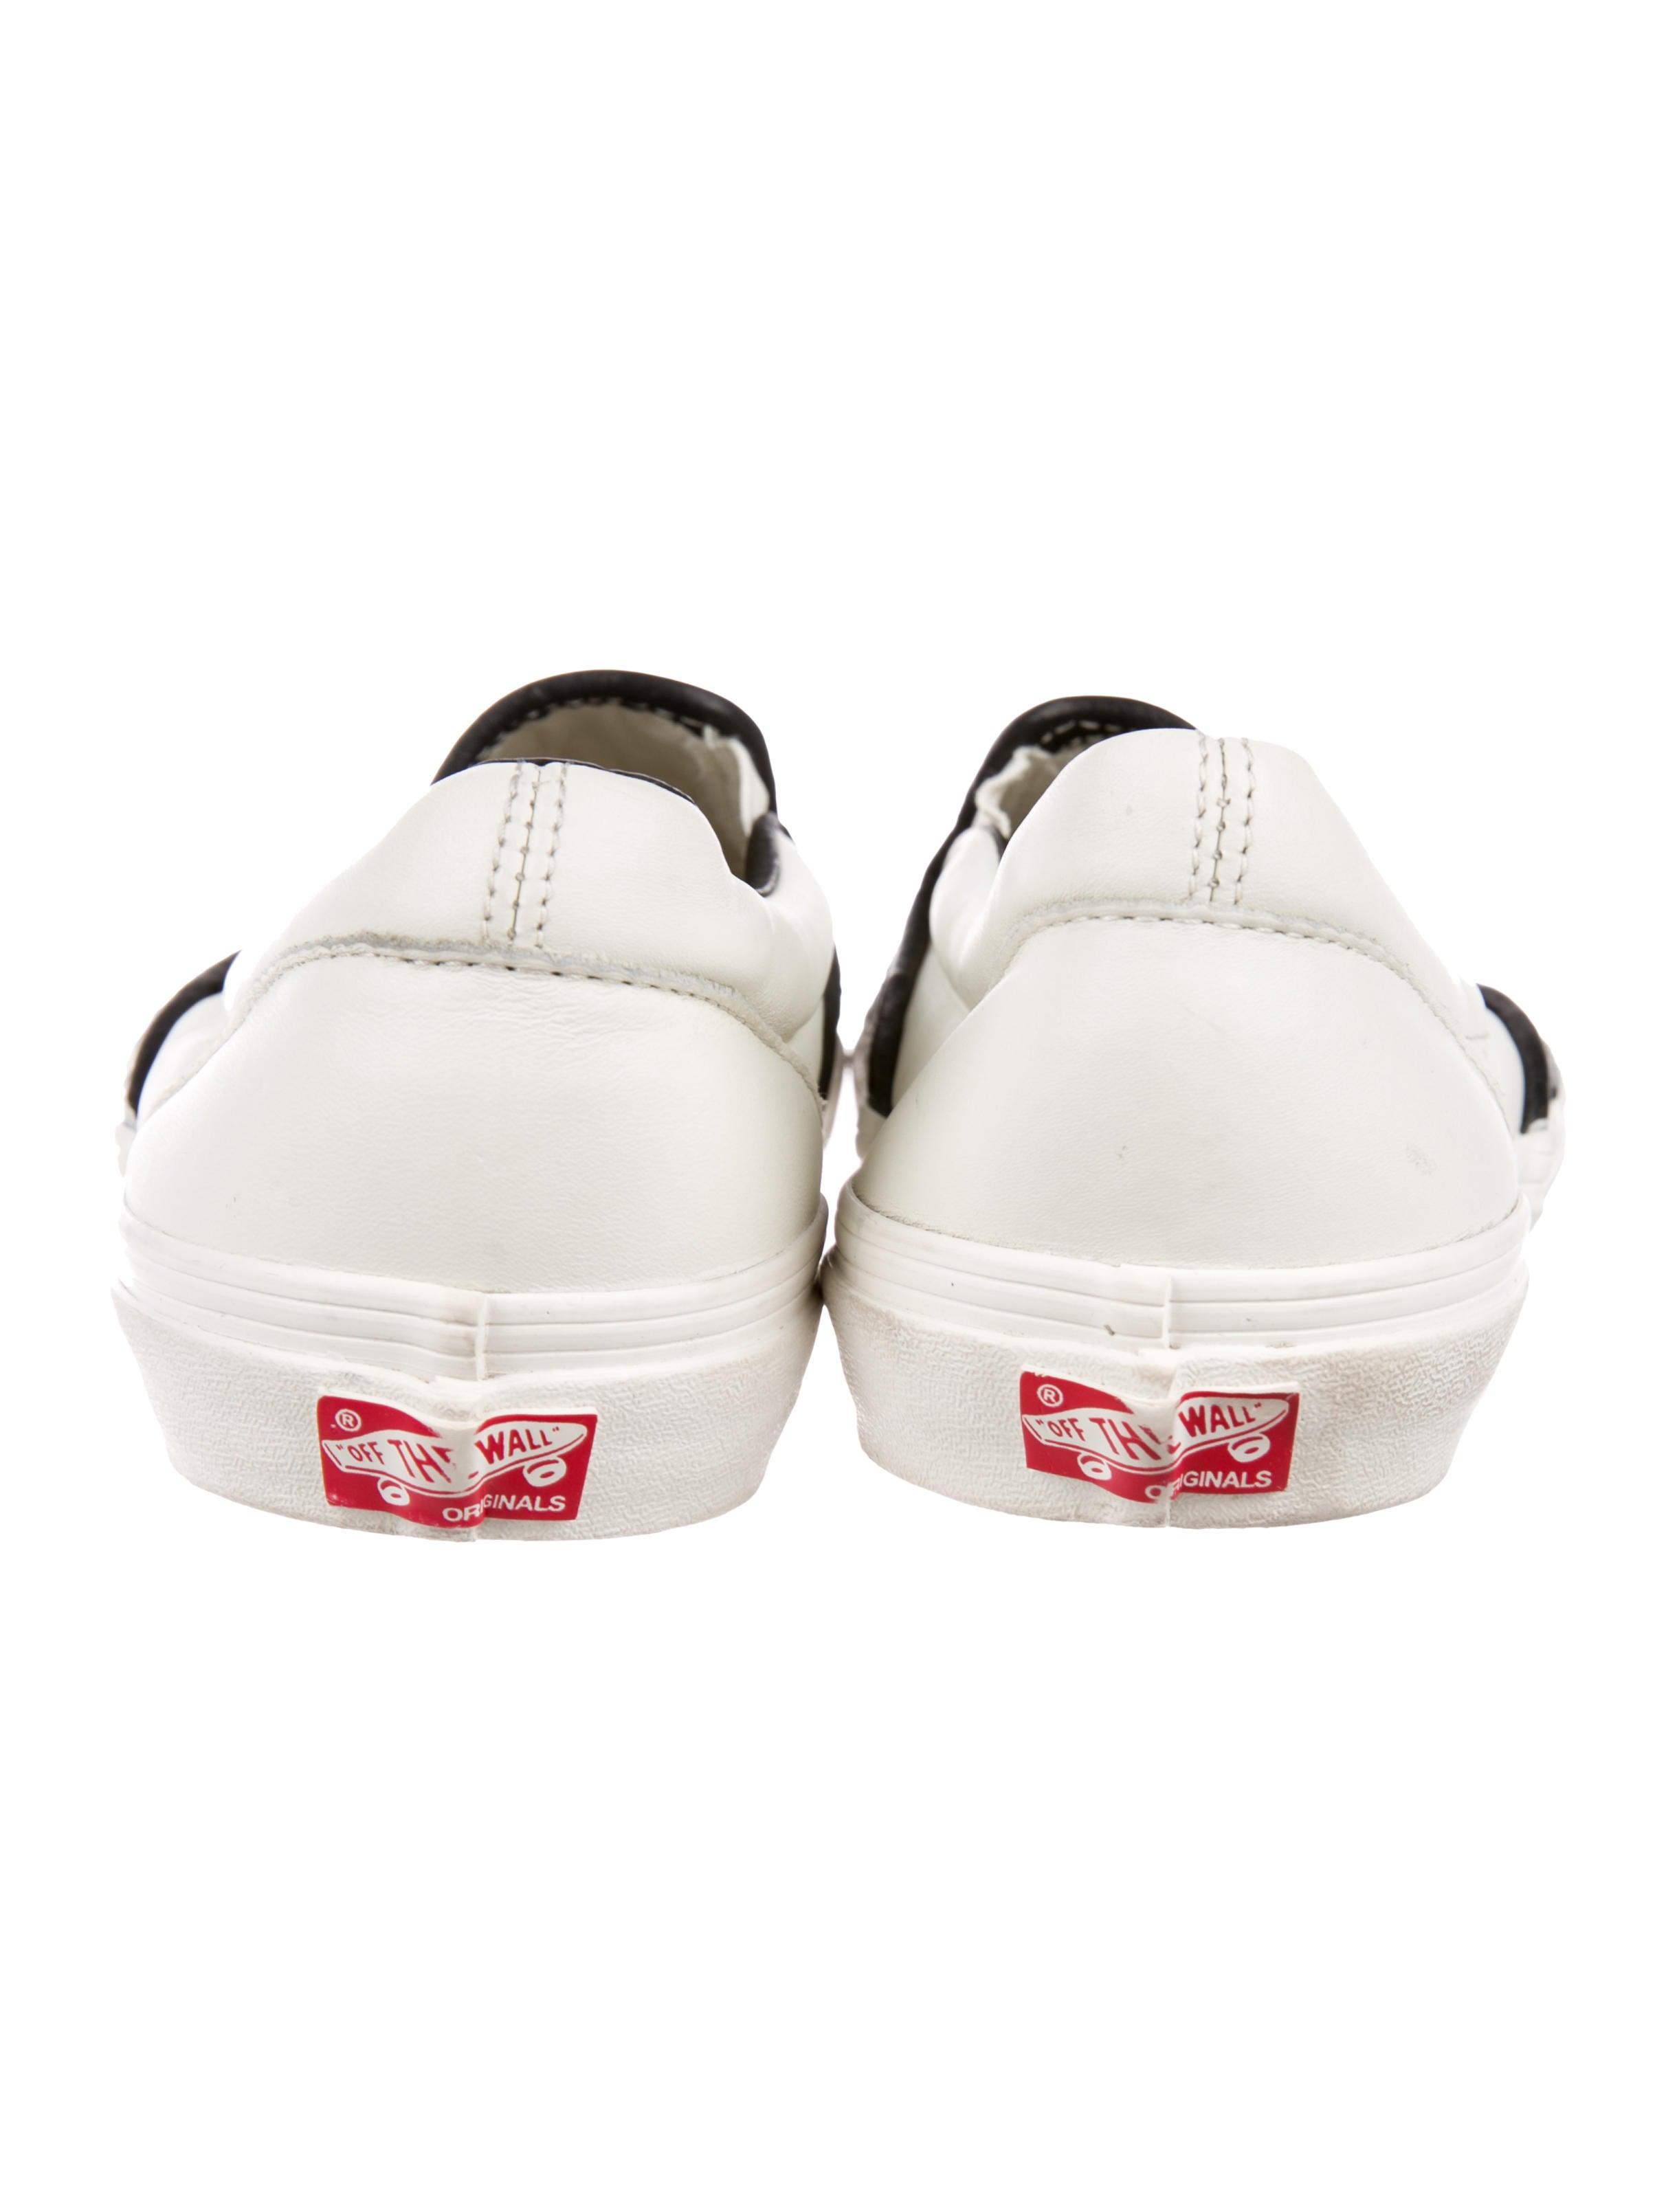 Vans Woven Leather Slip On Sneakers Shoes WVANS20120